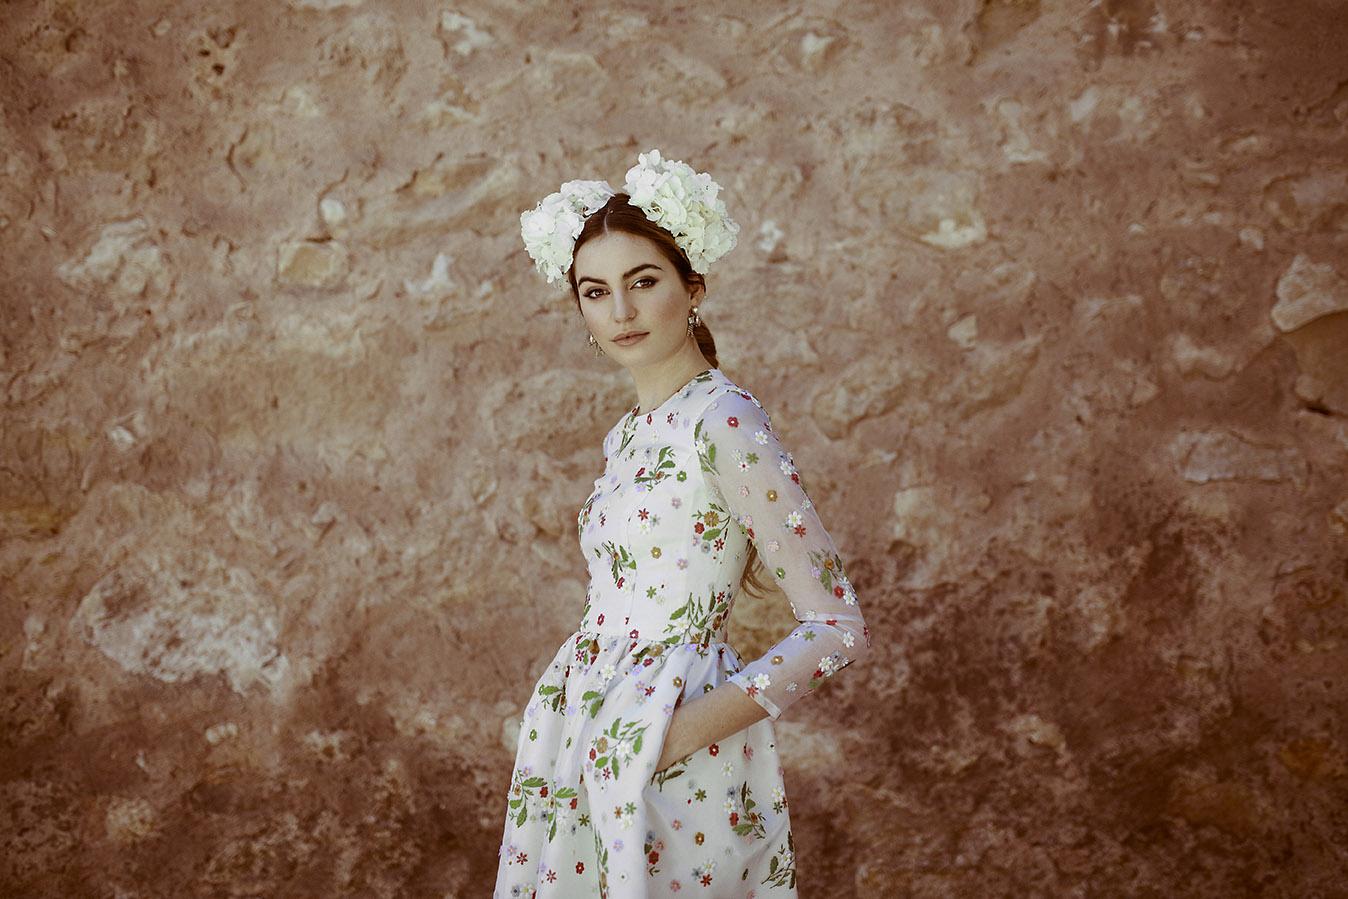 Invitadas con estilo vestido flores kolonaki 7